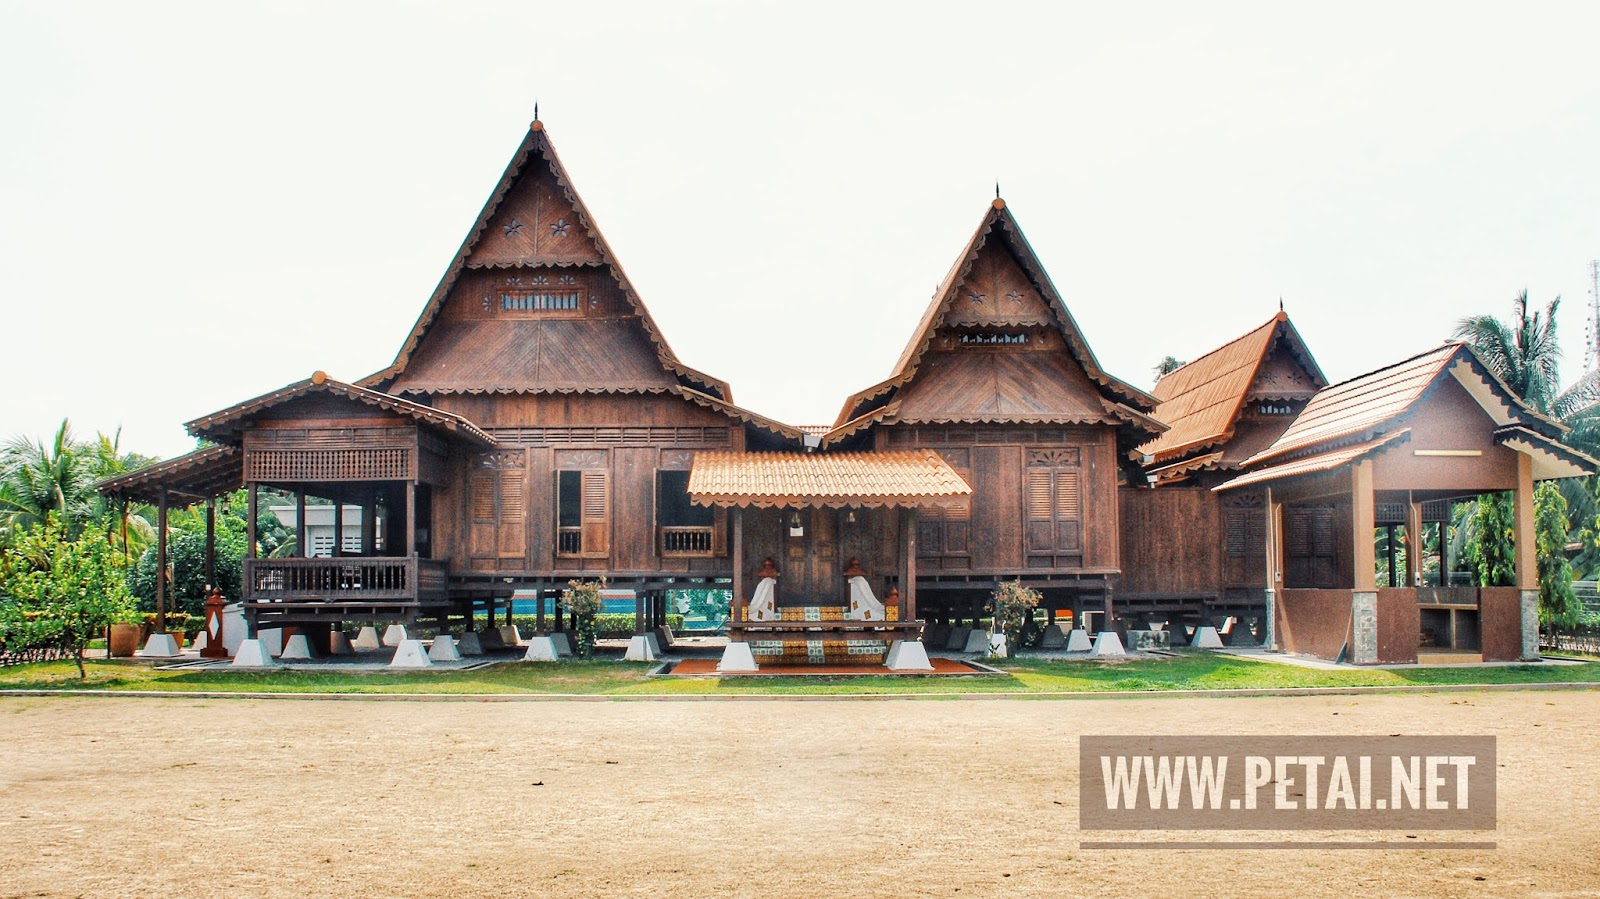 Hang Tuah Center Melaka - Rumah Hang Tuah